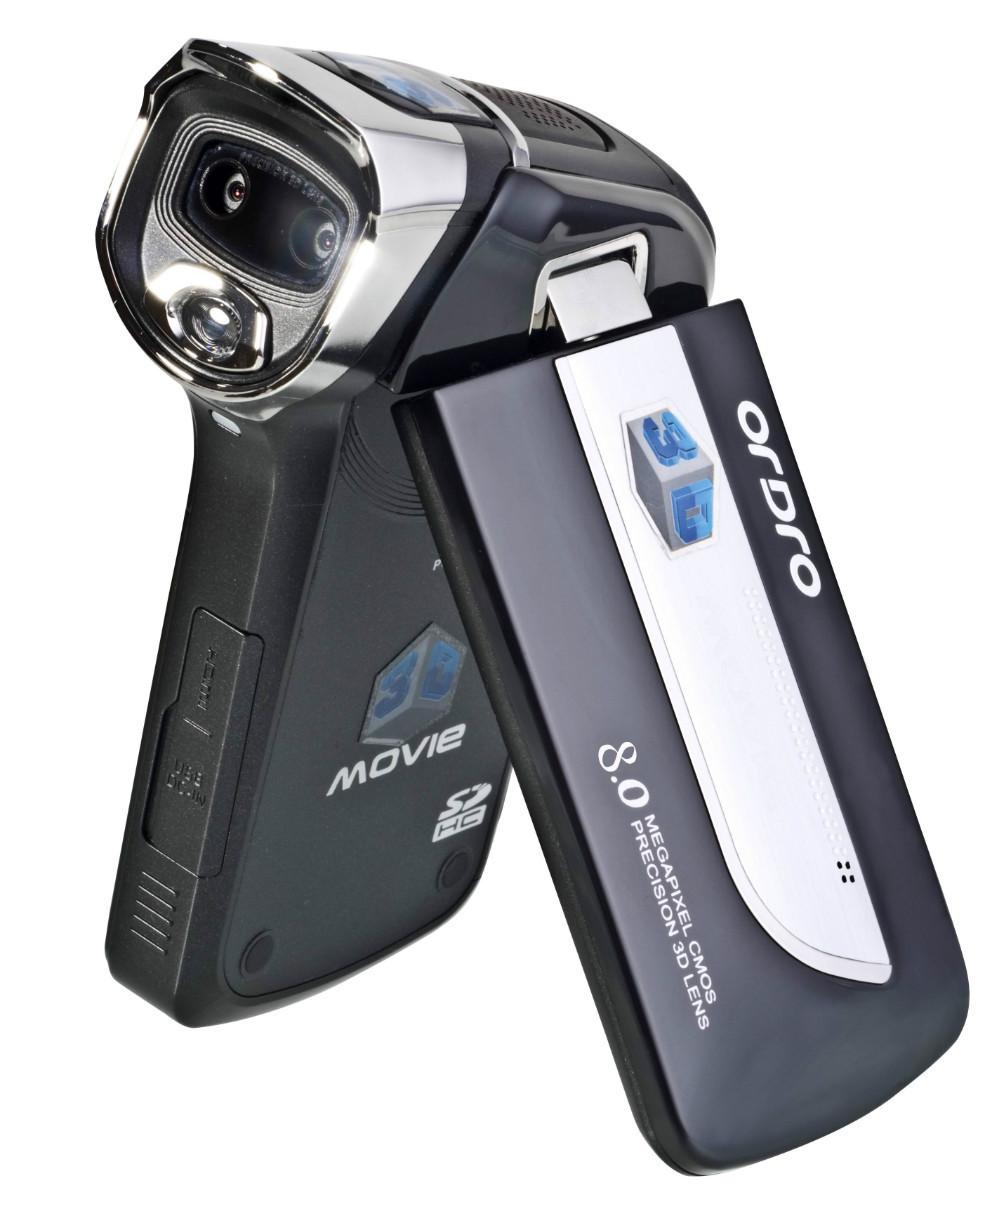 HDV-VD1 720p HD 4X digital zoom 5M CMOS Sensor X 2 3D camcorder mini video camera usb 2.0 Li-in battery Family DV(China (Mainland))